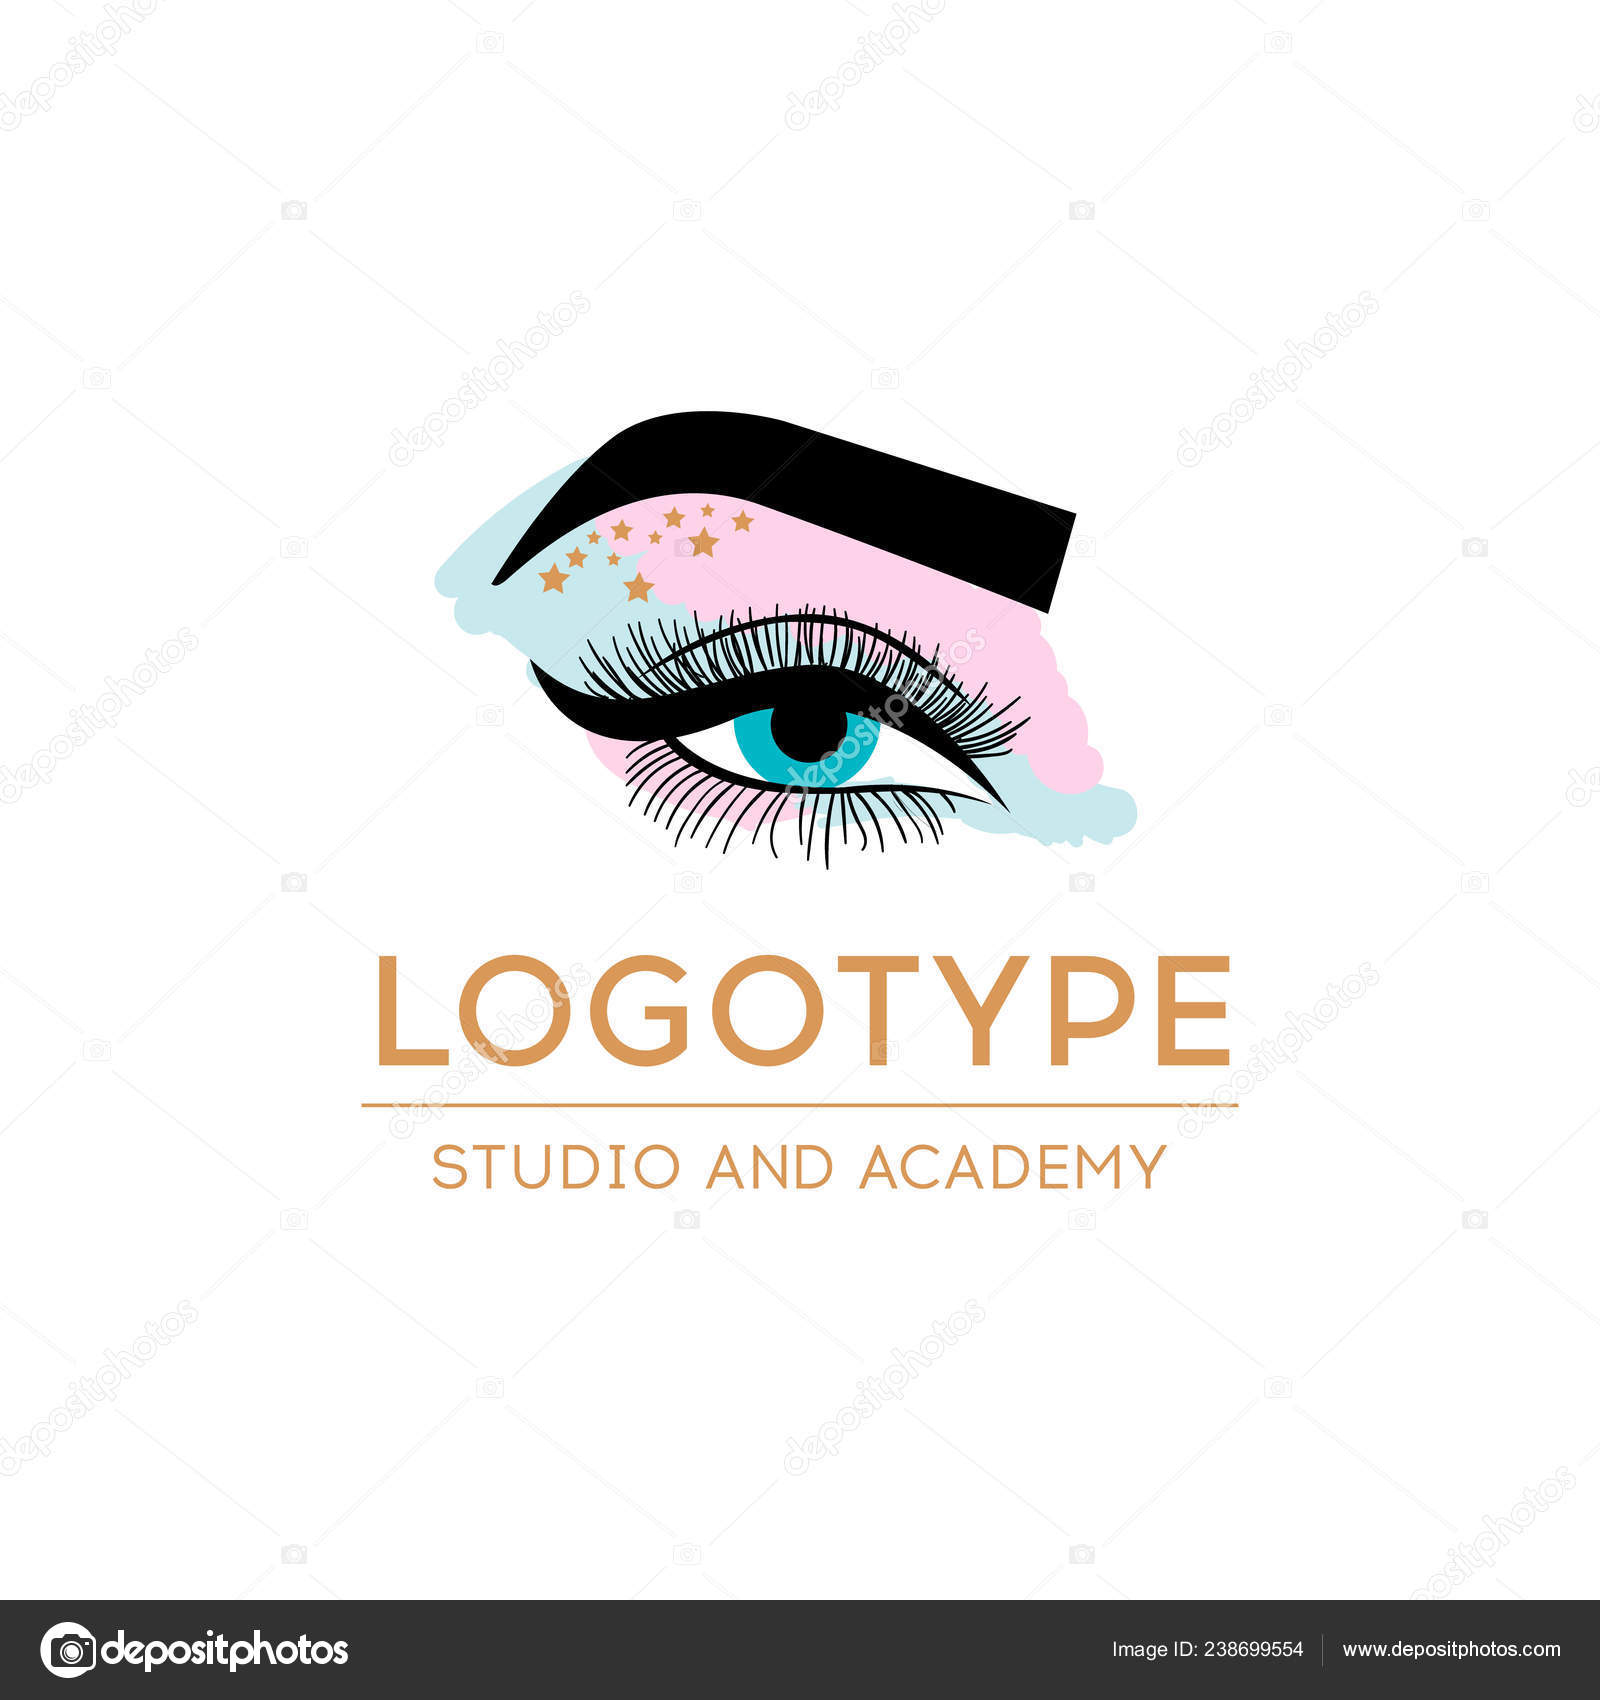 117bc8688f5 Luxury Beauty Eye Lashes Logo. Eyelash extension logo. Vector illustration  in a modern style